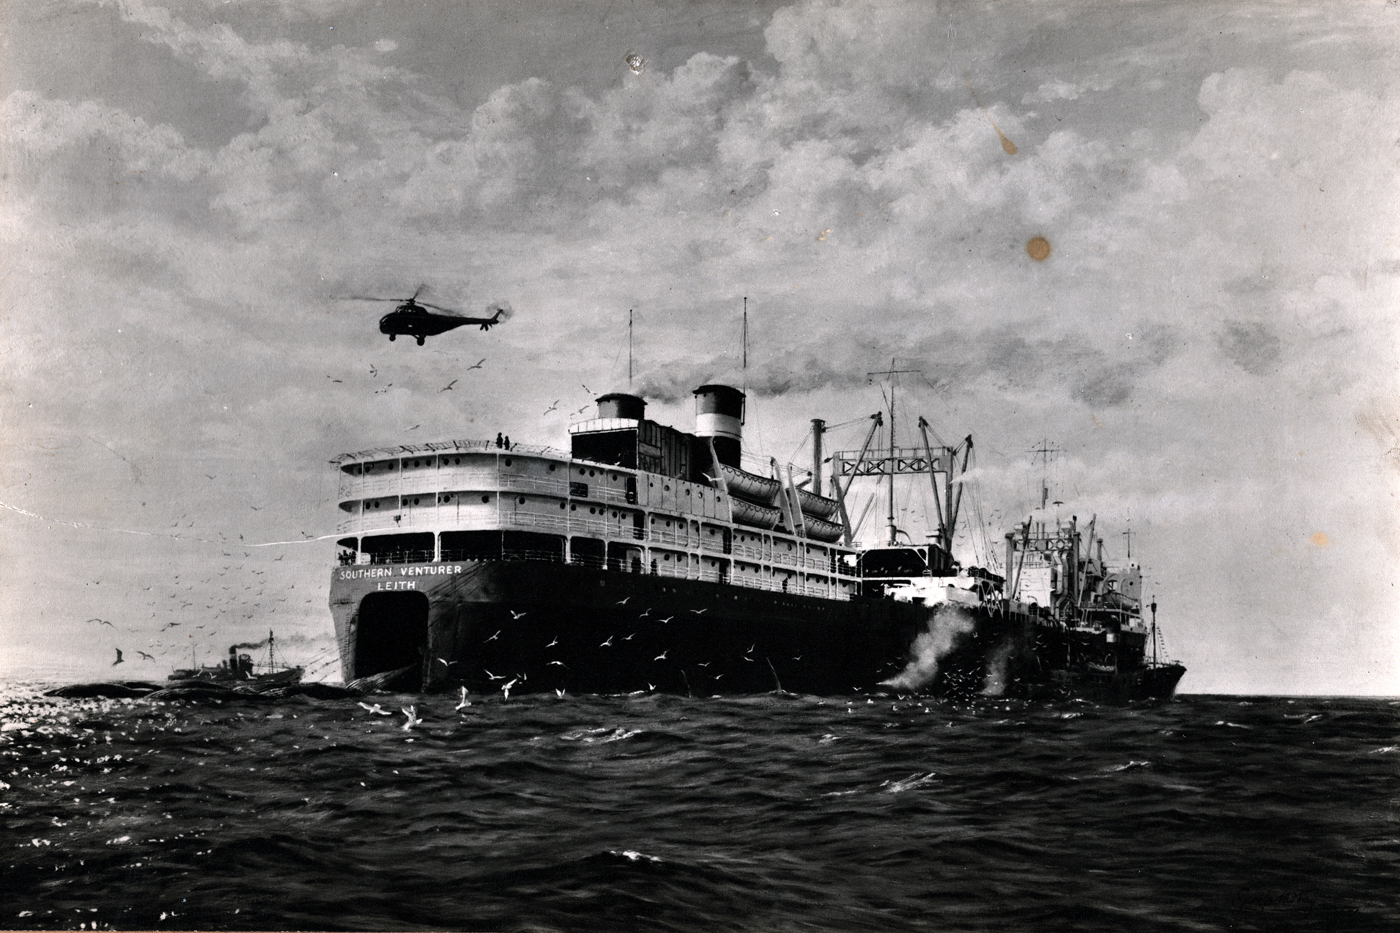 Whale Factory Ship 'Southern Venturer' c.1955